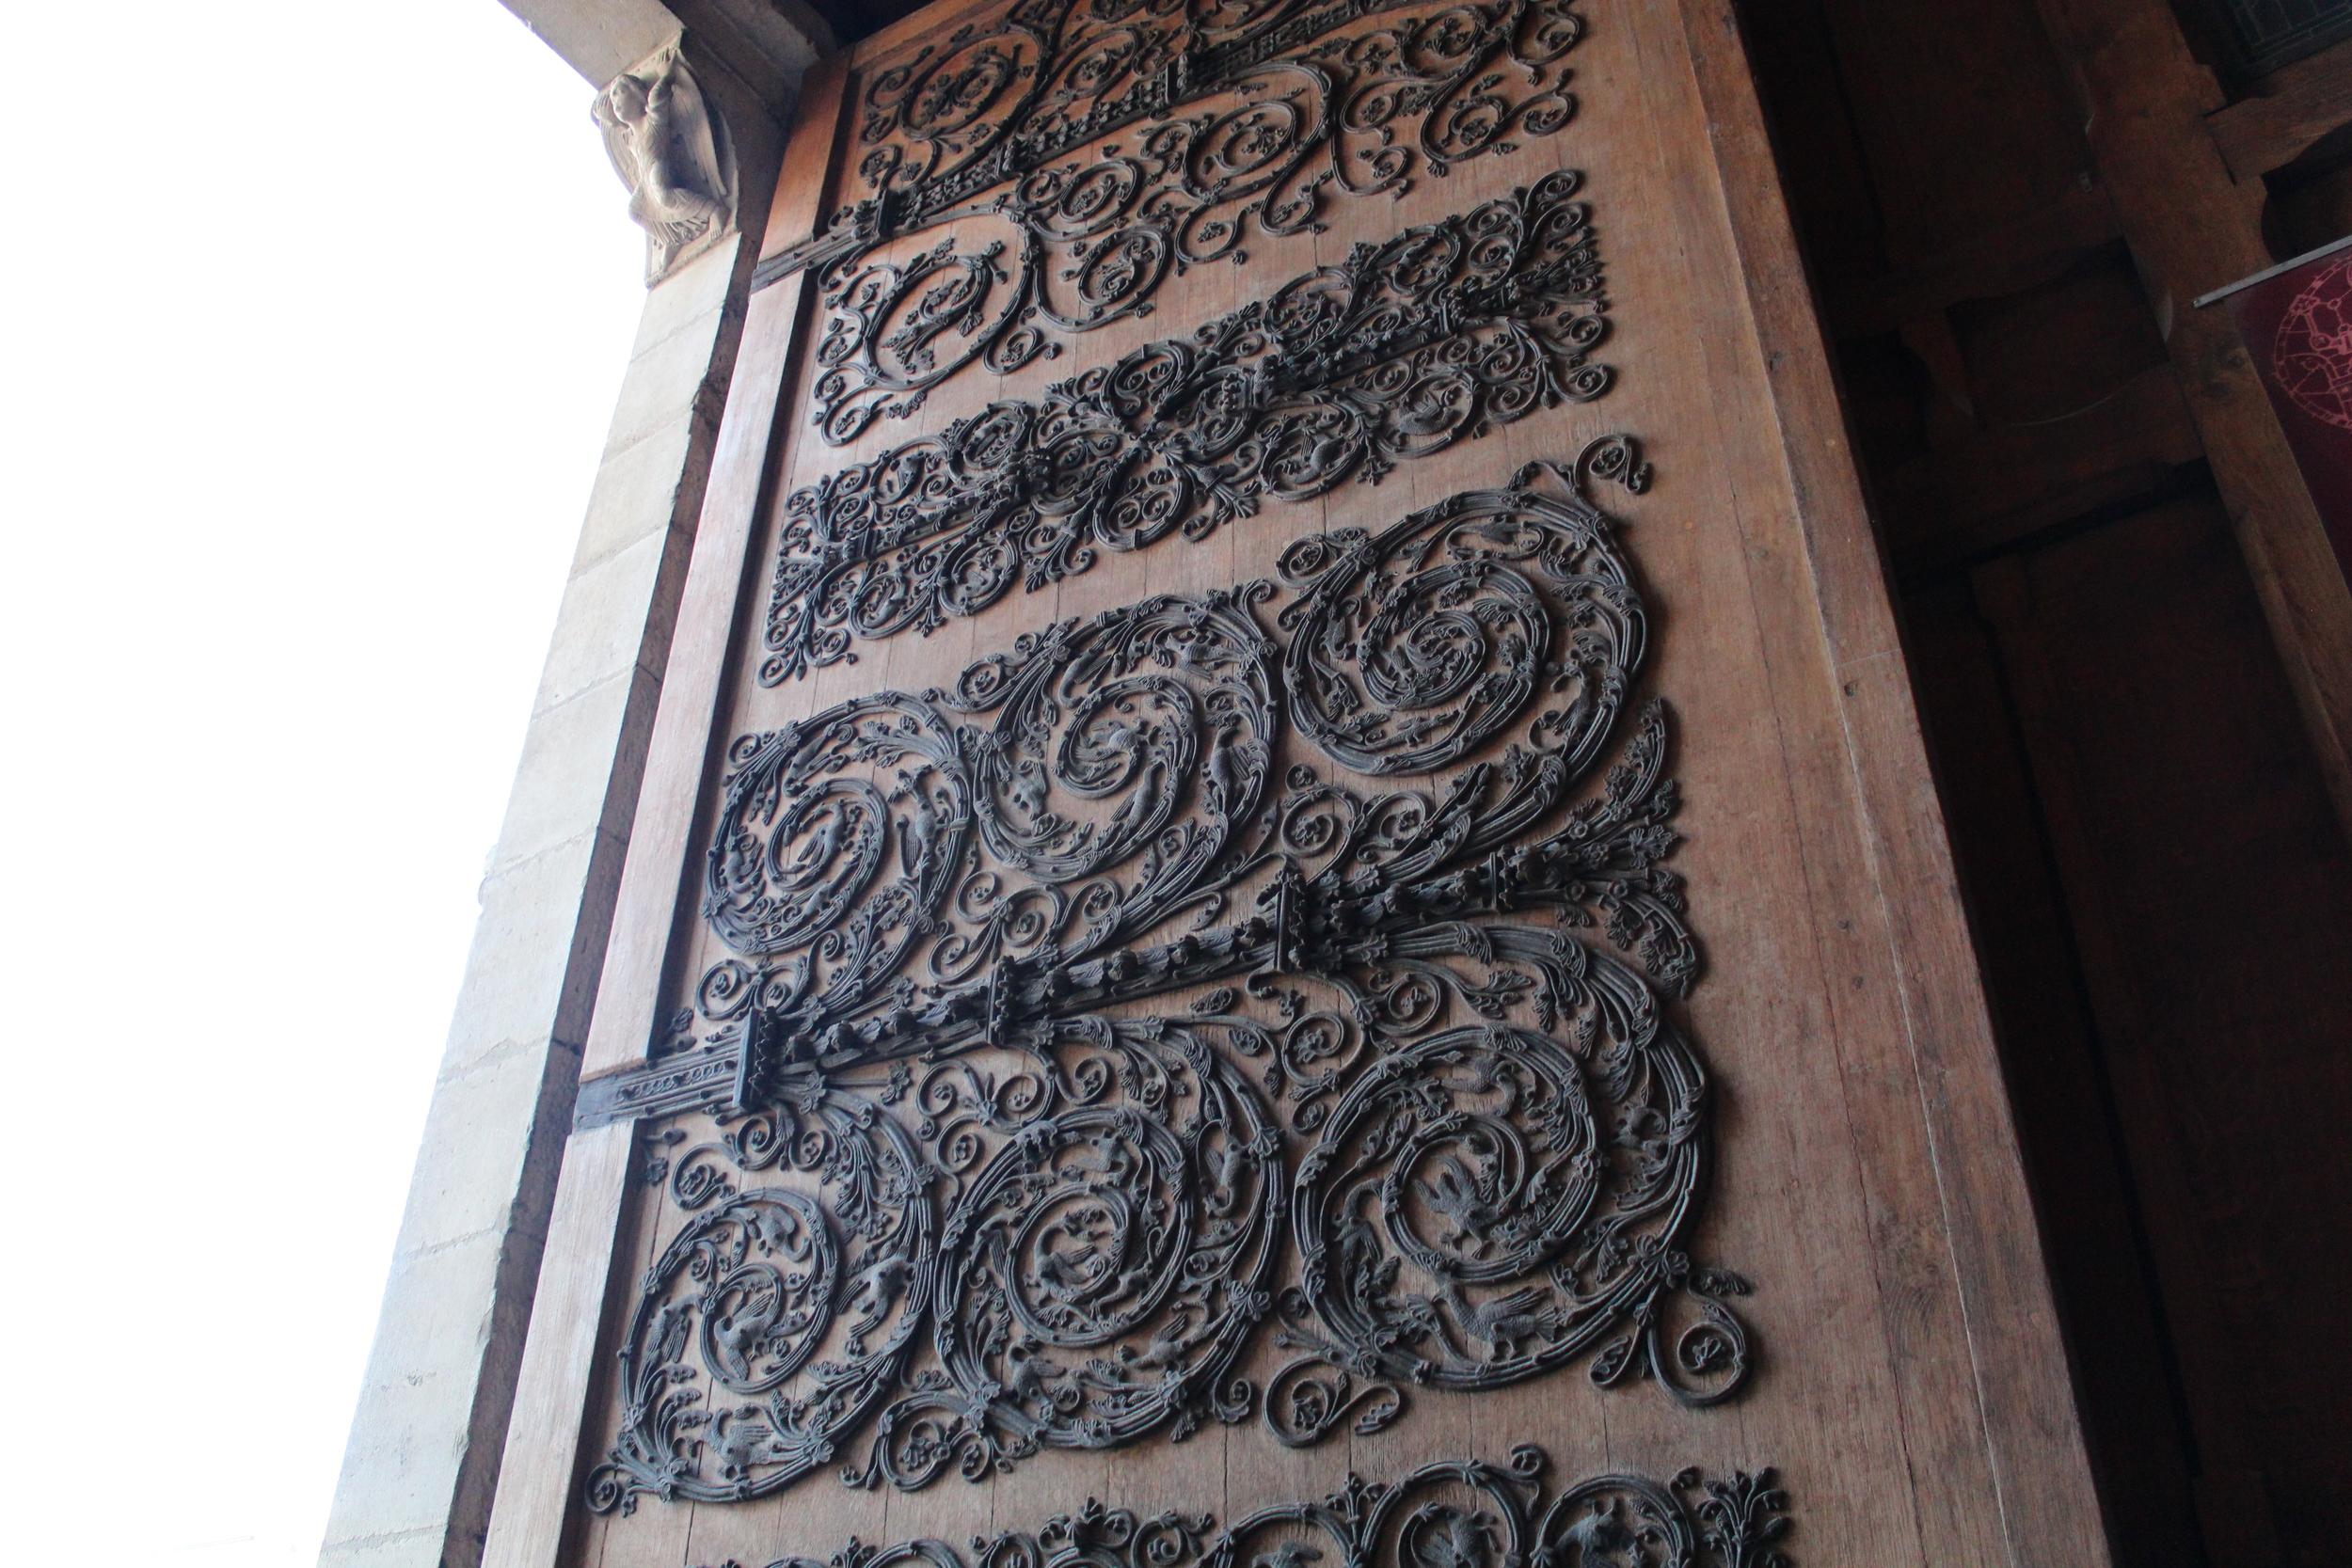 Doors at Notre Dame